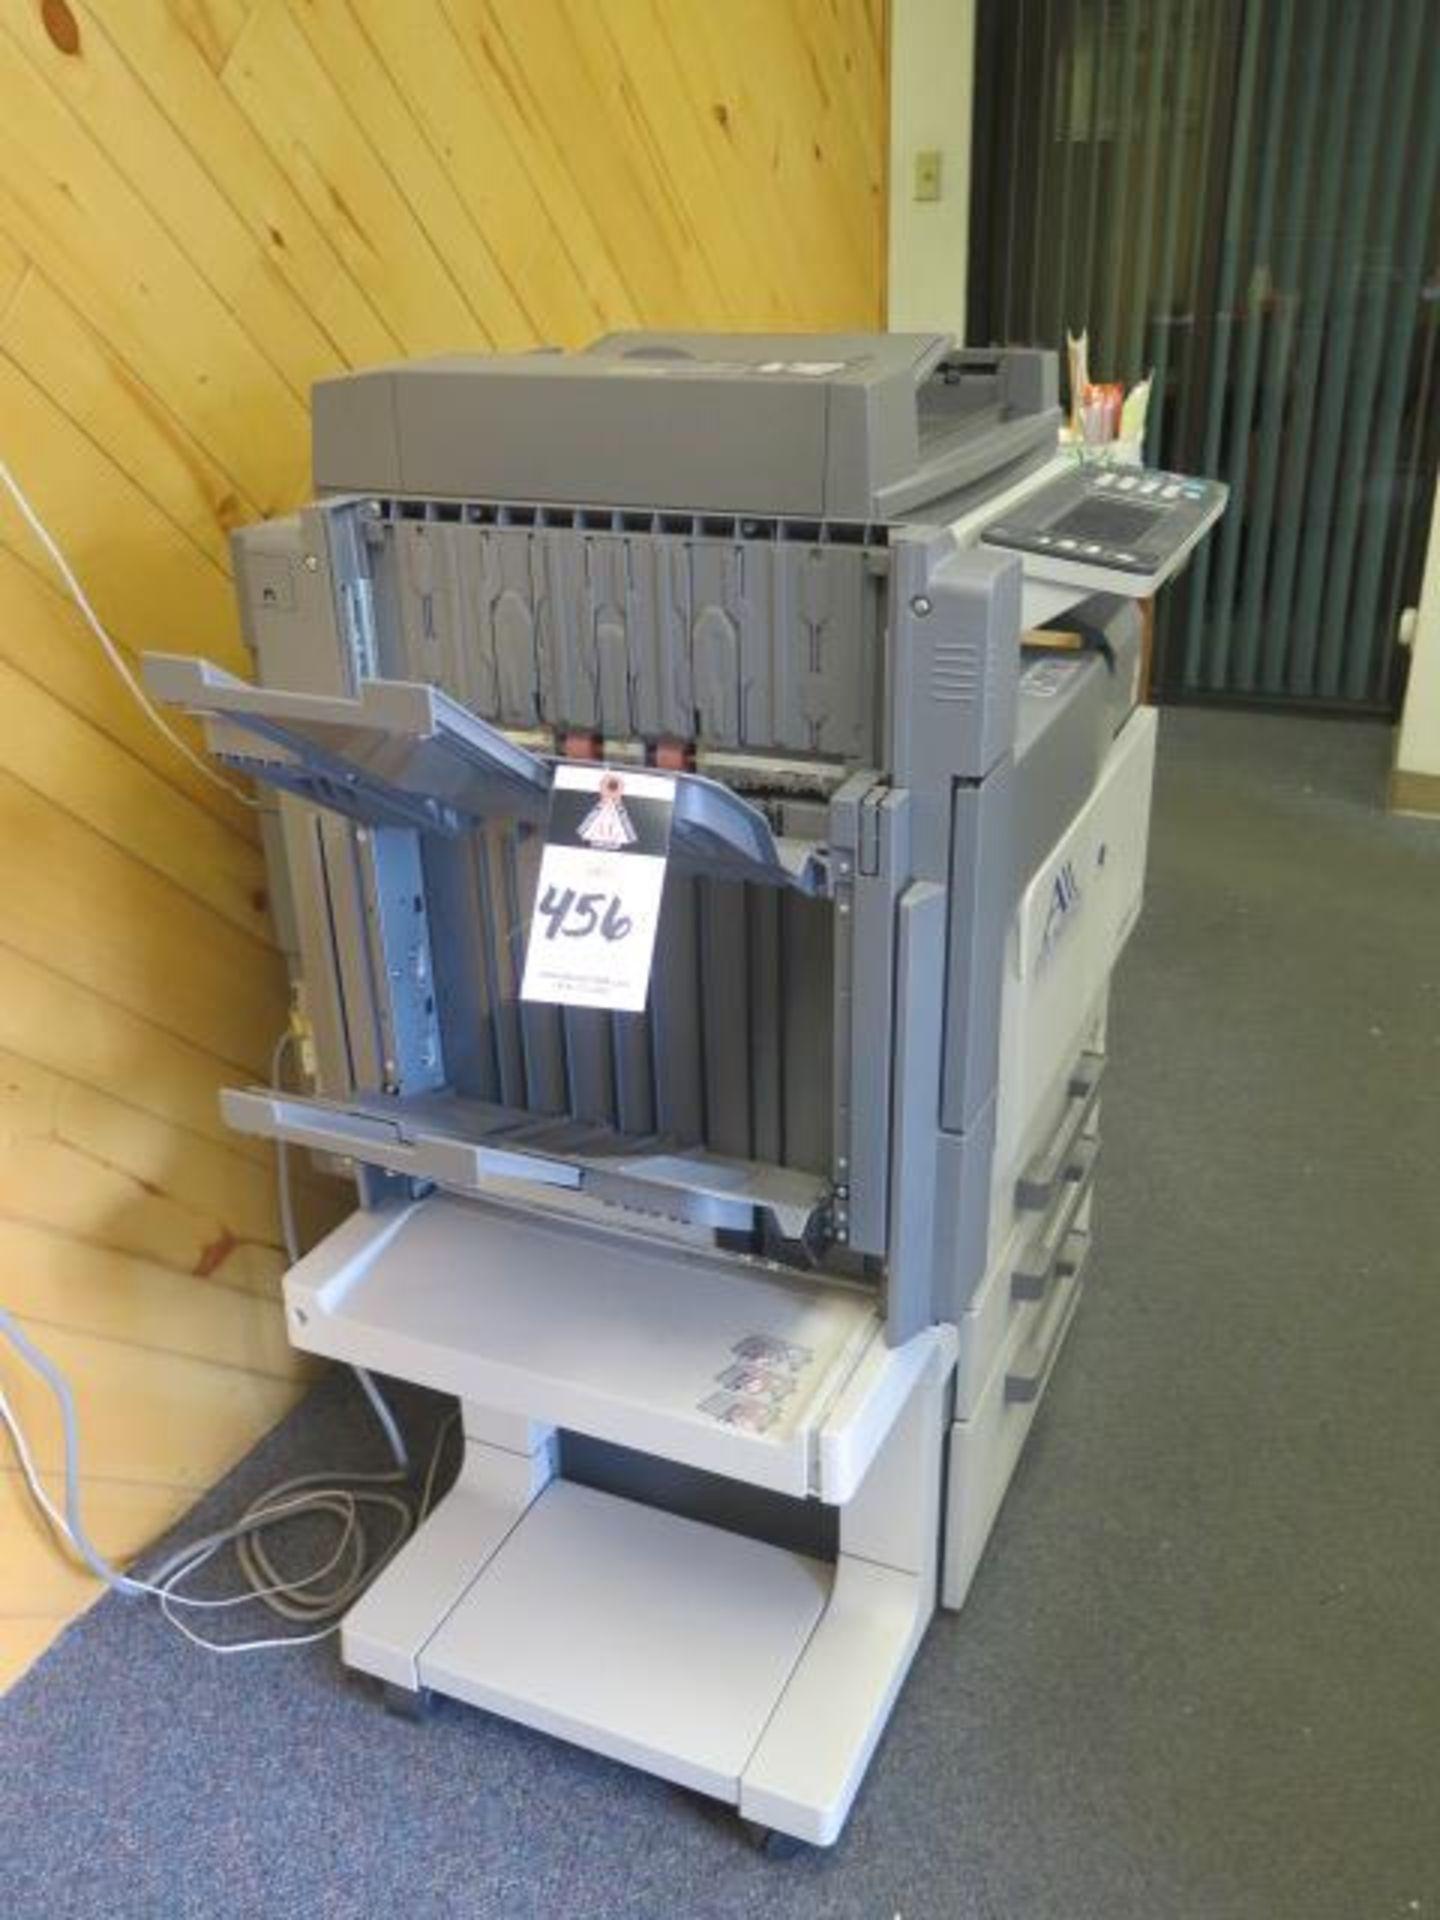 Konica Minolta bizhub C252 Color Copy Machine - Image 3 of 5